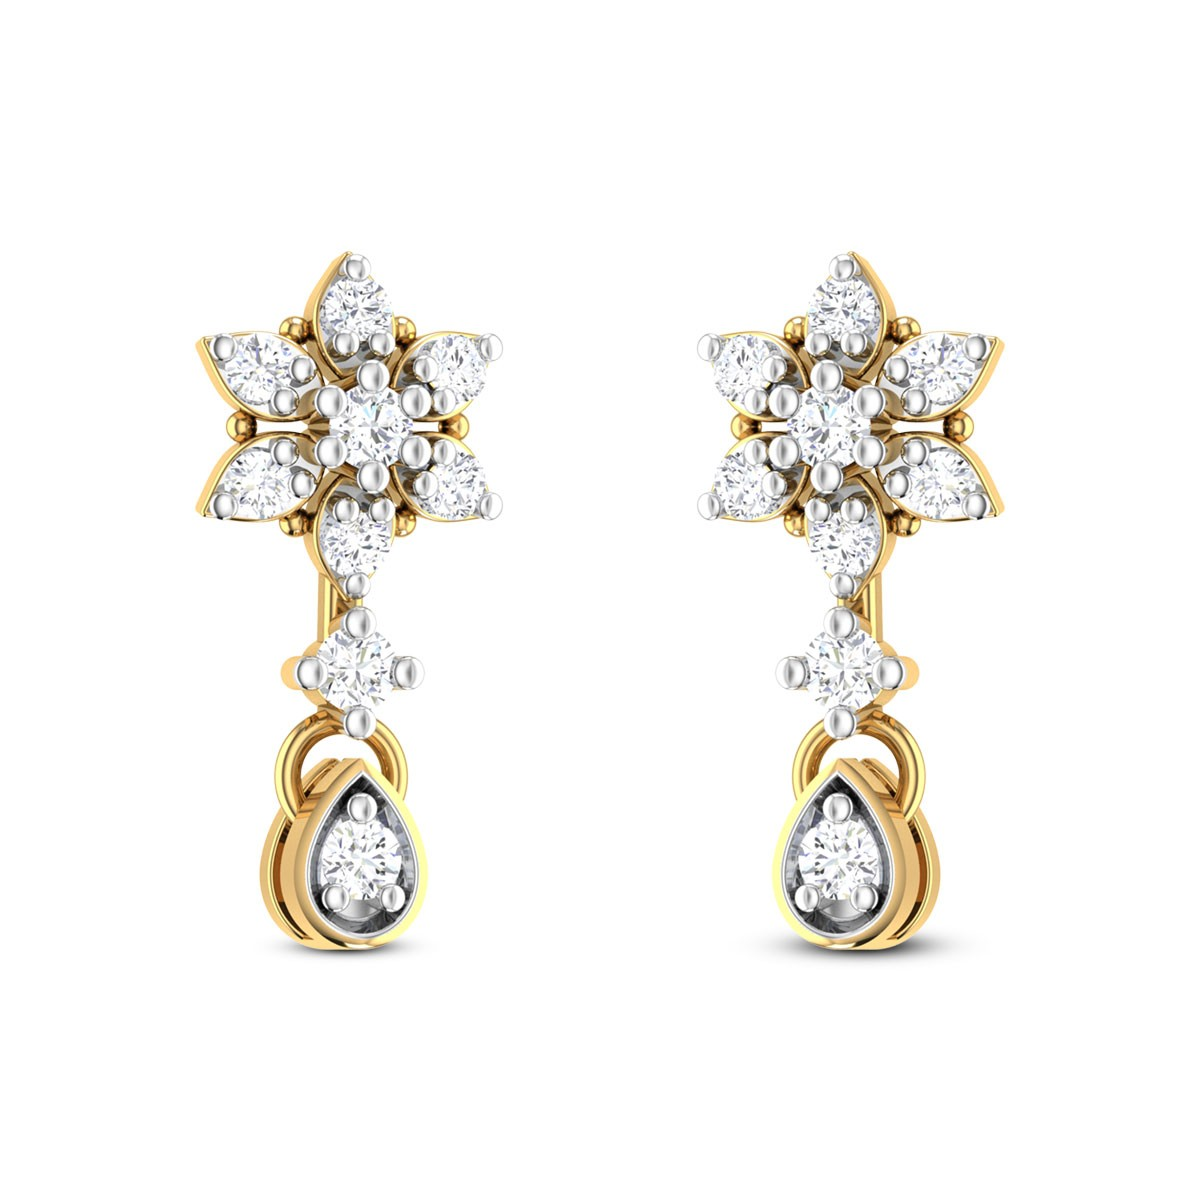 Vega Diamond Earrings